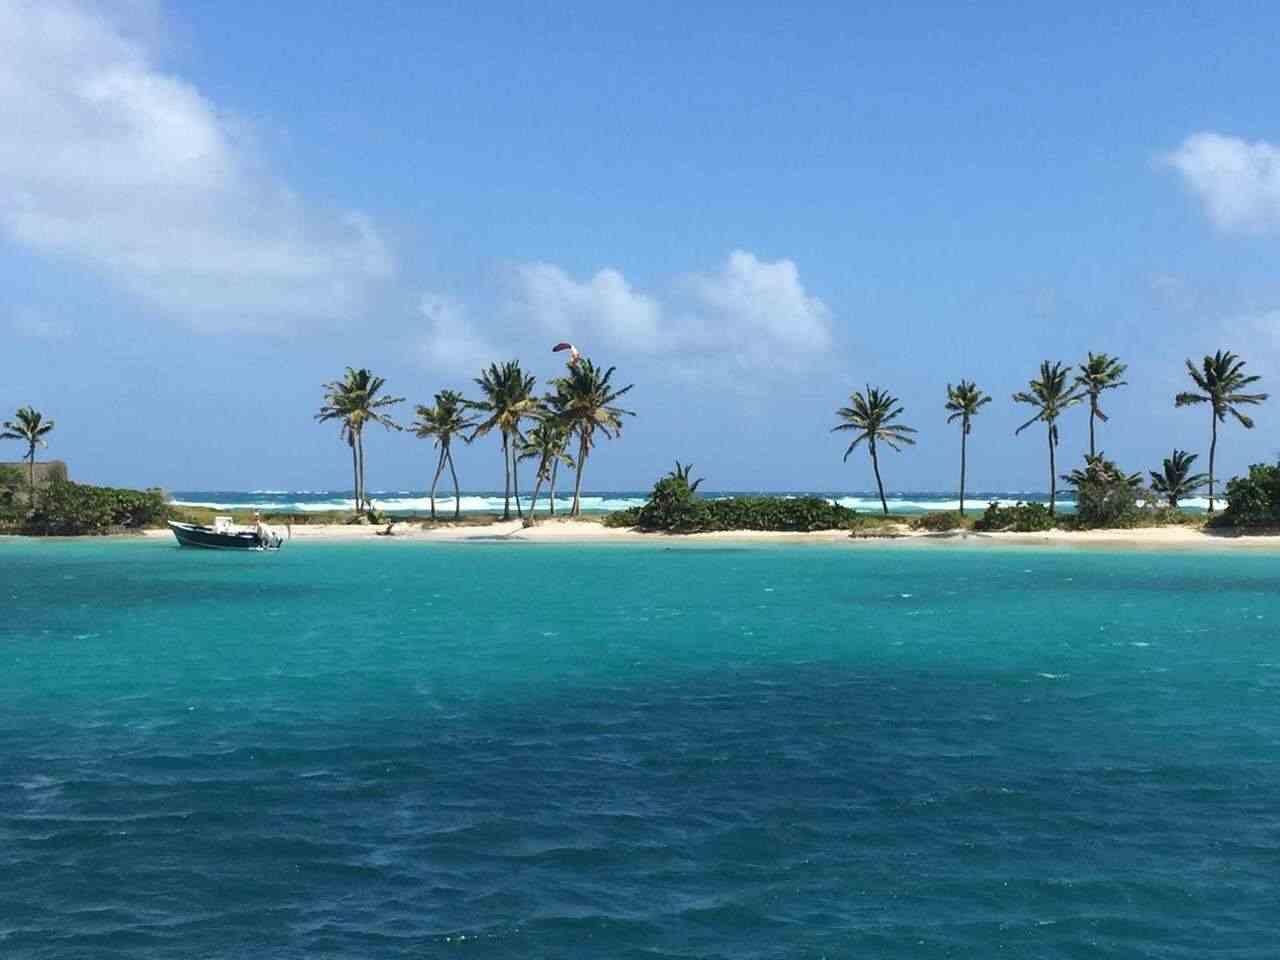 Natale ai Caraibi in barca a vela